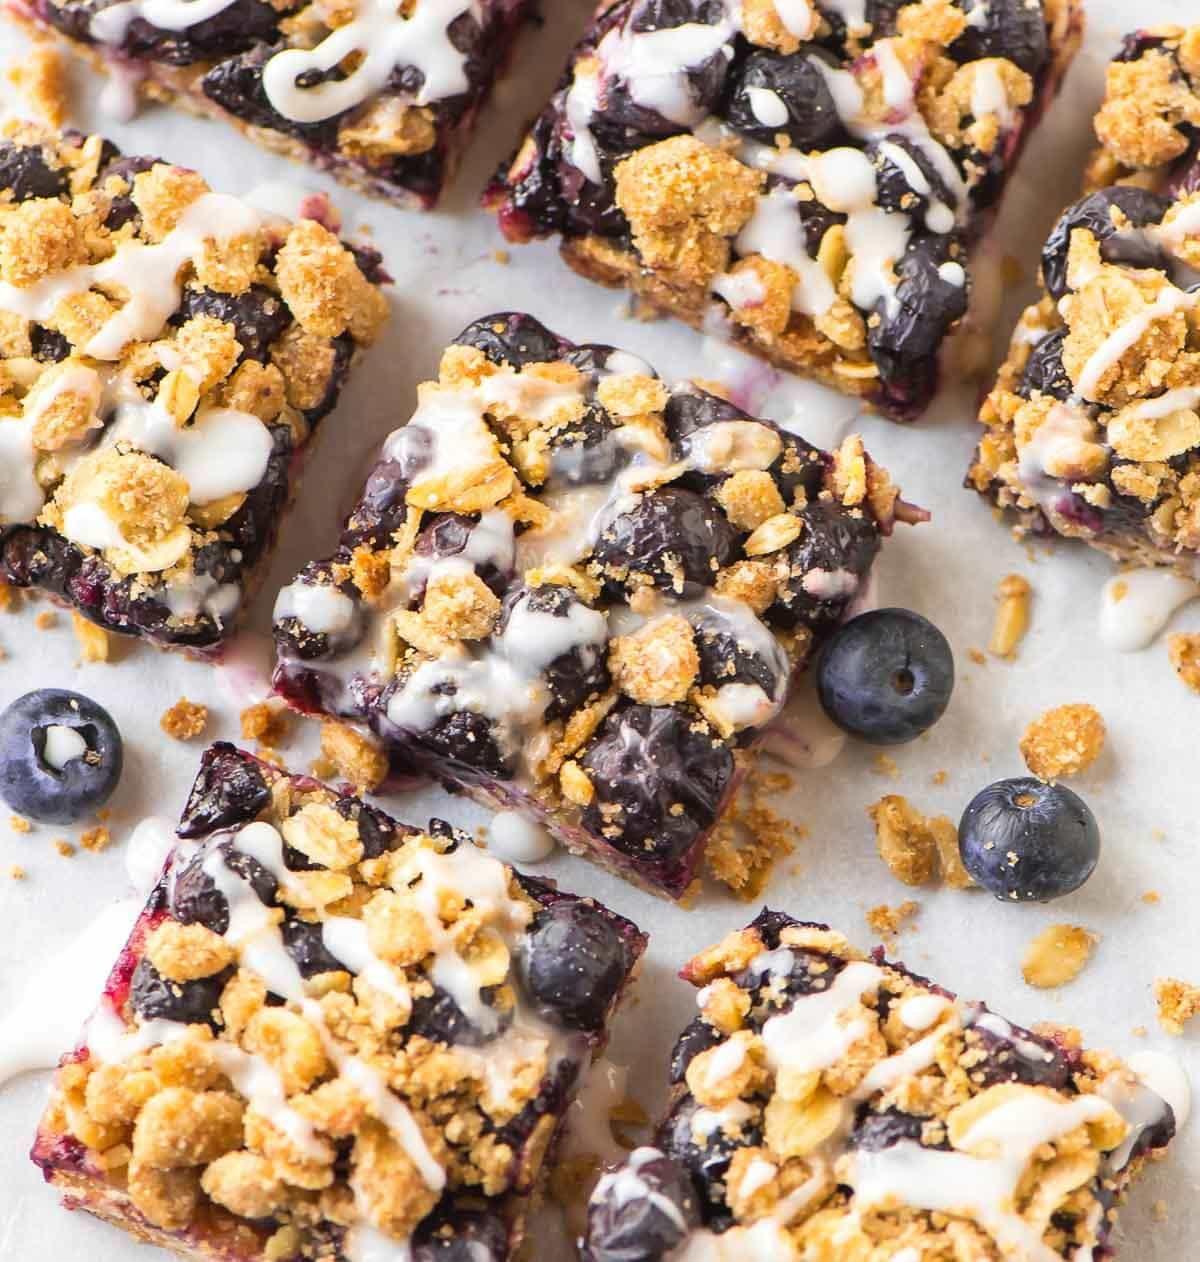 Healthy Oatmeal Breakfast Bars Recipe Easy  Blueberry Oatmeal Bars